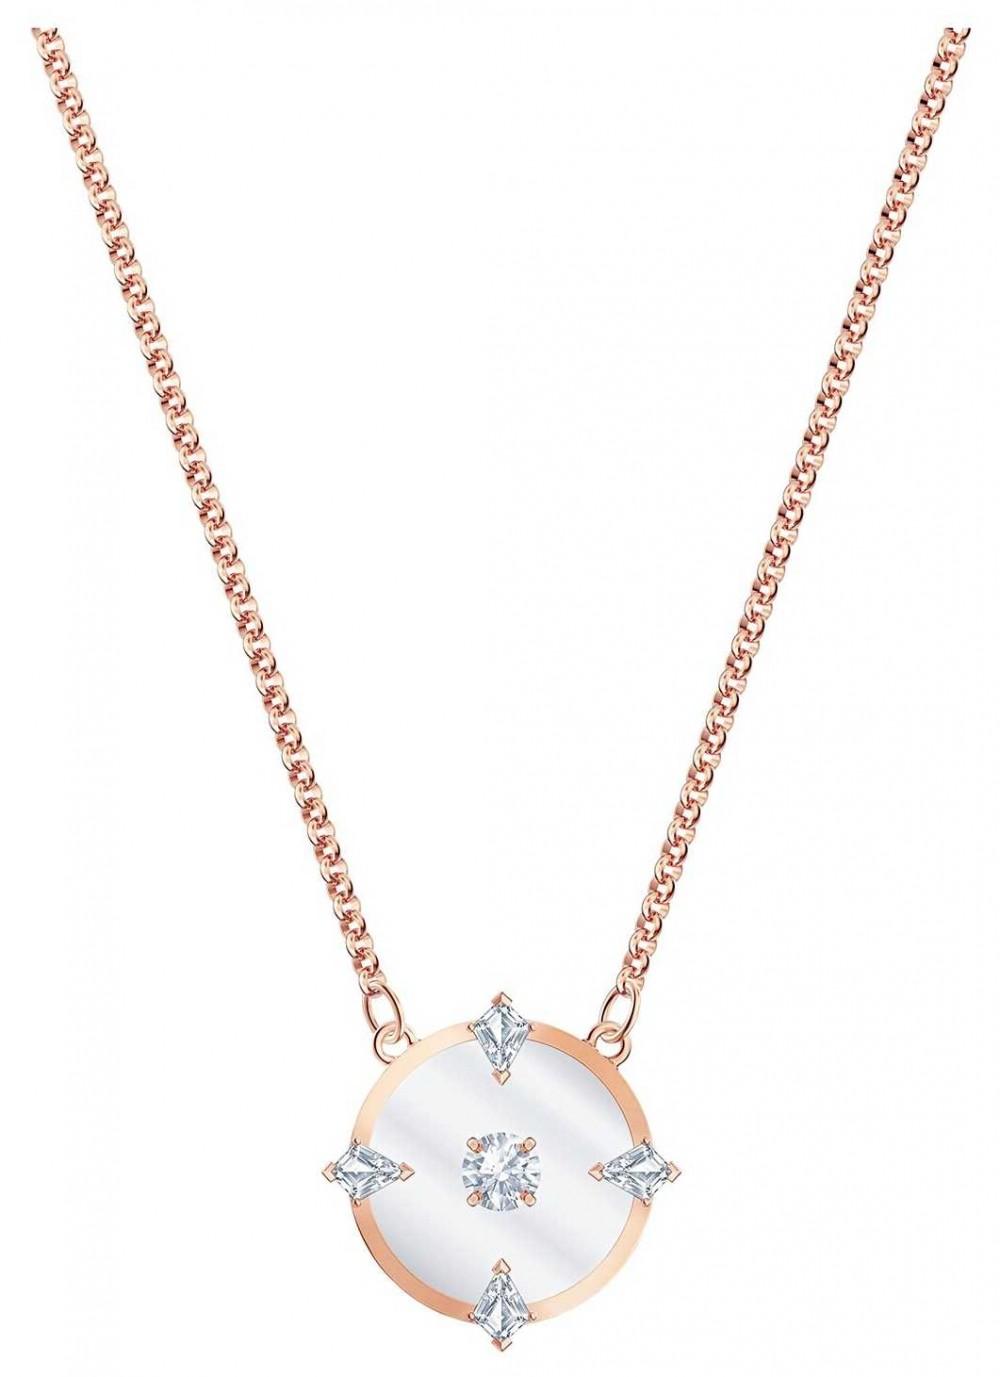 Swarovski North | Rose Gold Plated Necklace | White 5488400